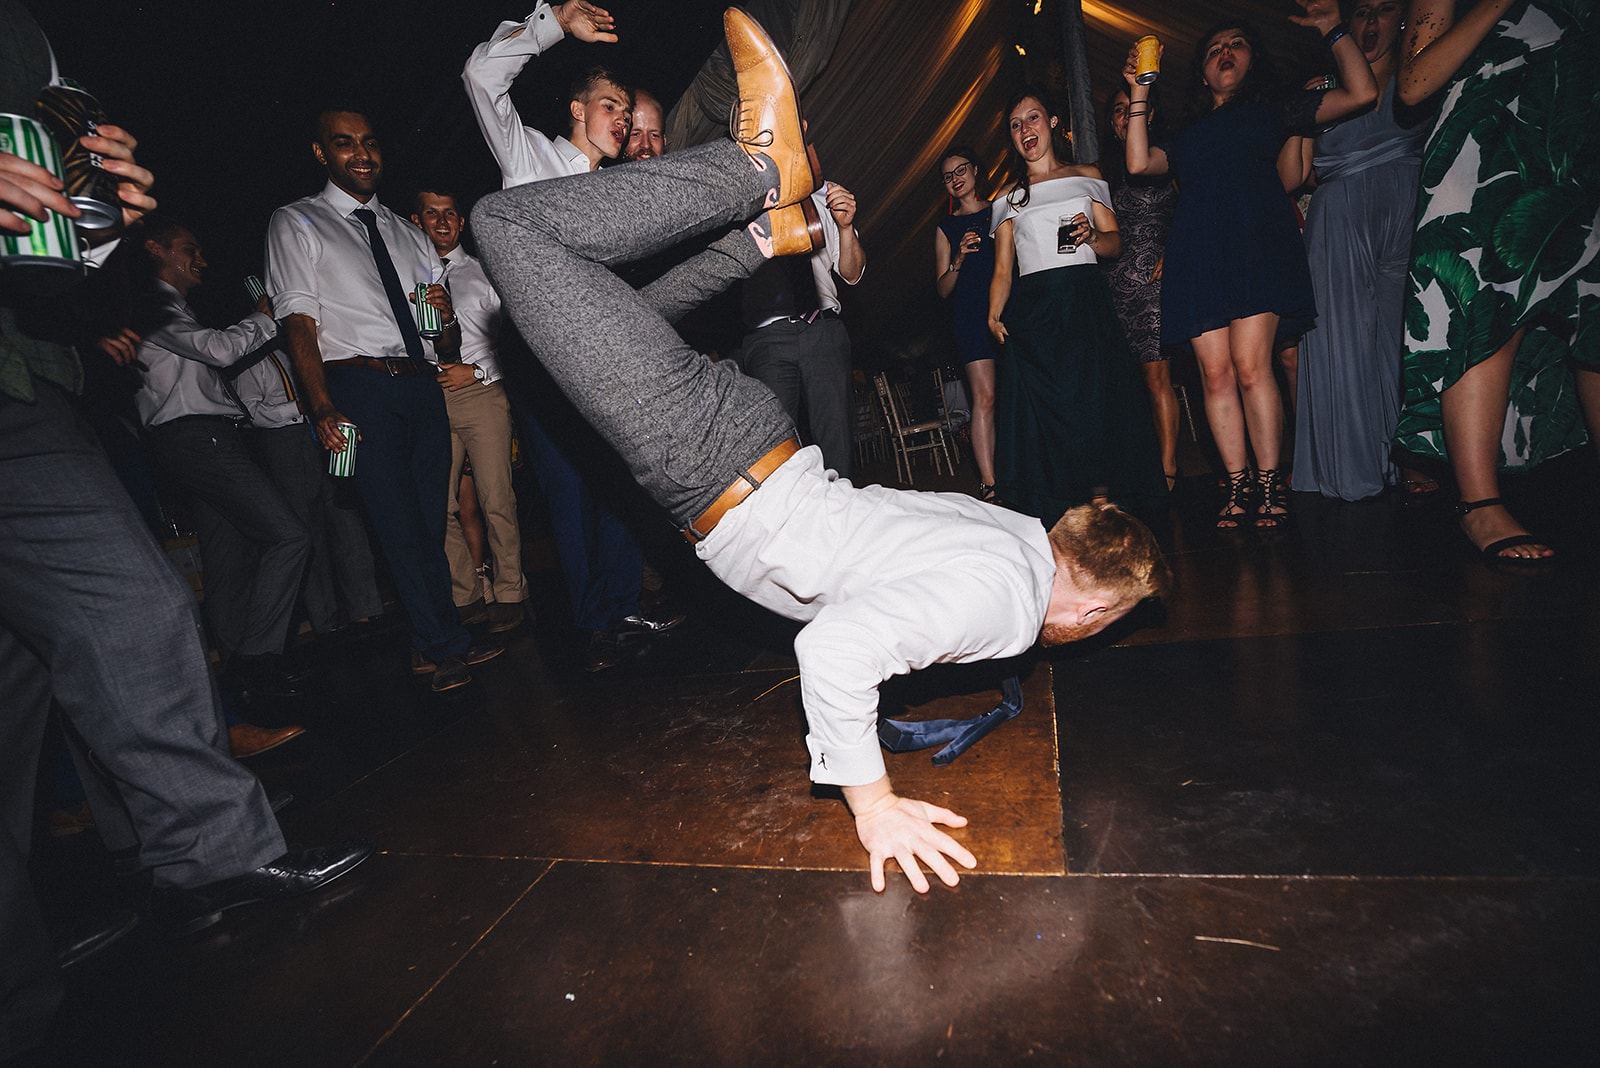 Wedding guest breakdancing